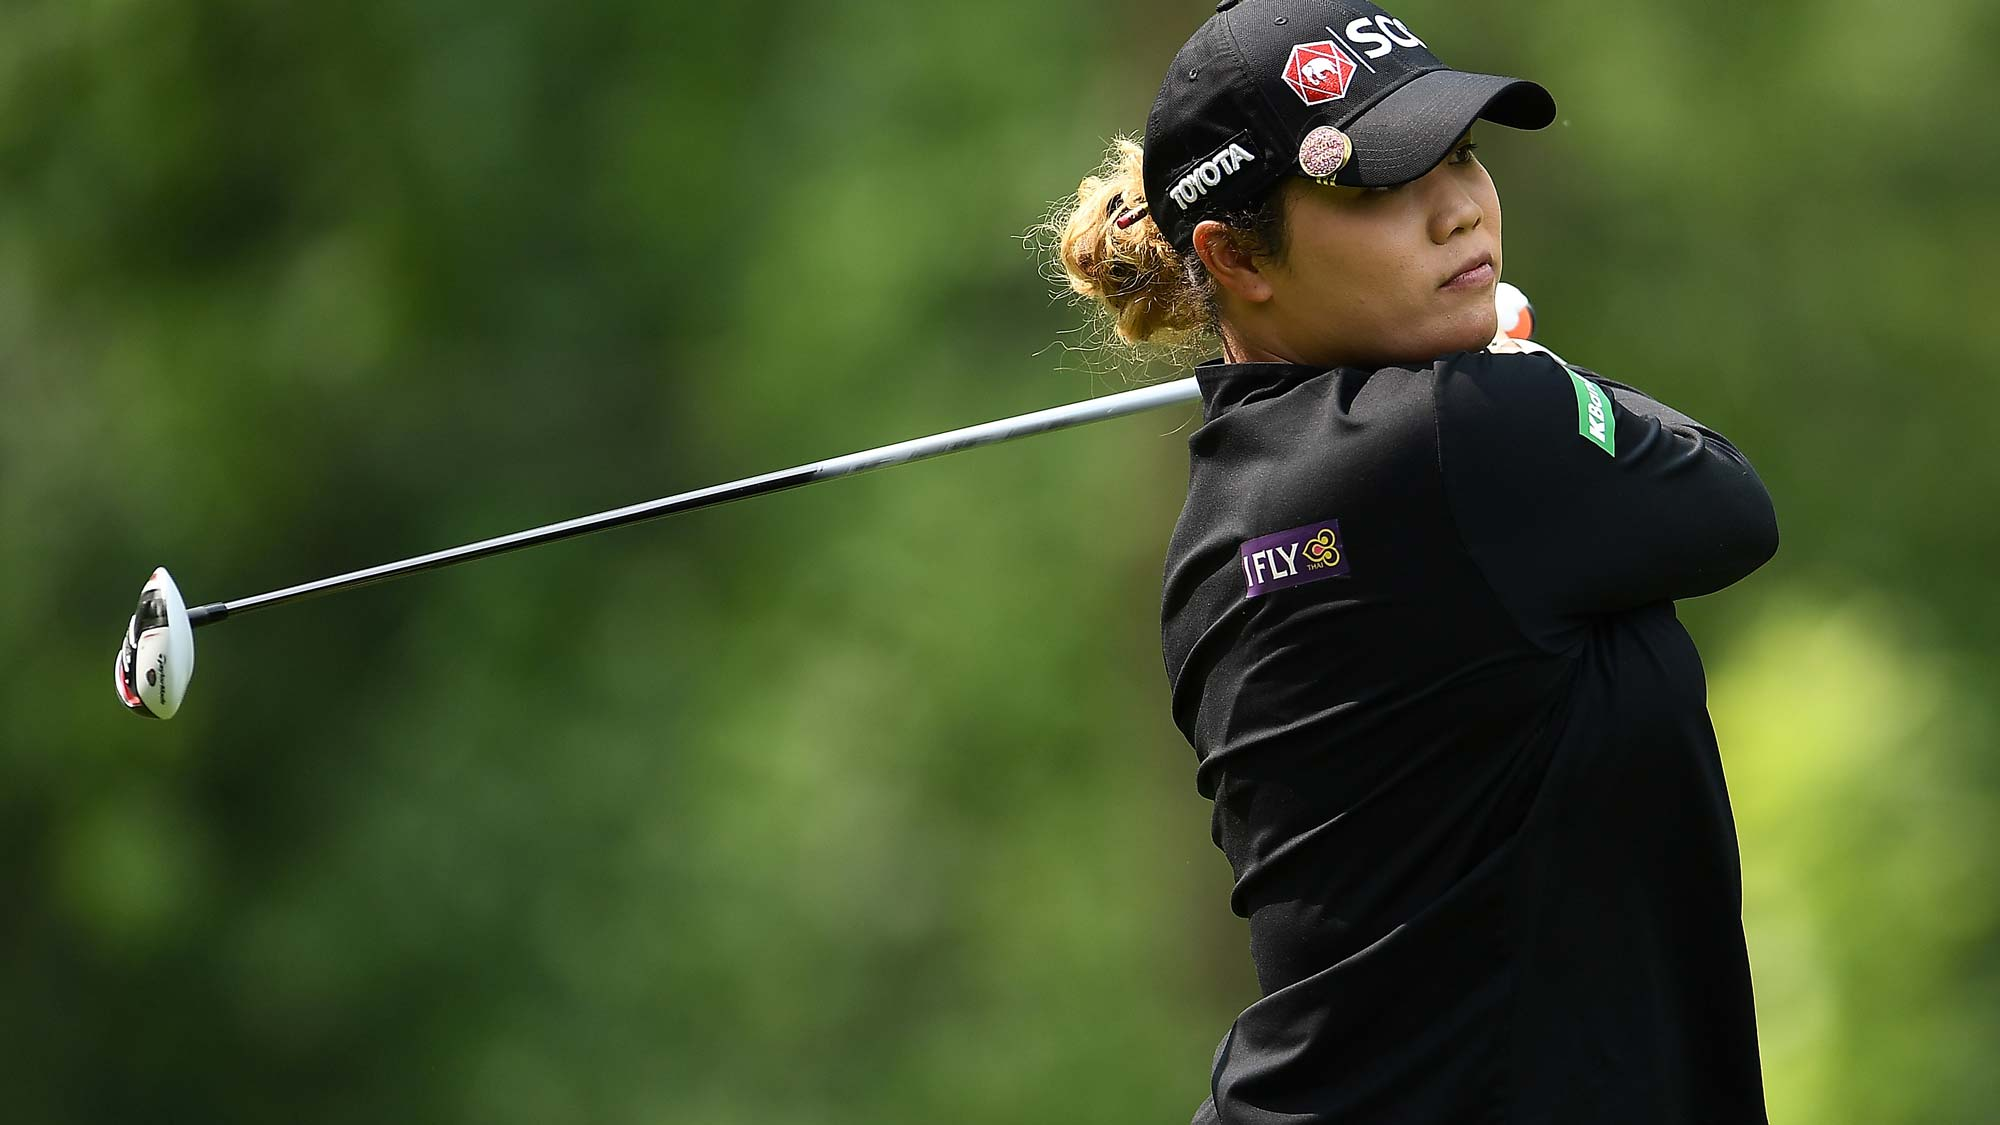 Ariya Jutanugarn of Thailand hits her tee shot on the third hole during the final round of the Thornberry Creek LPGA Classic